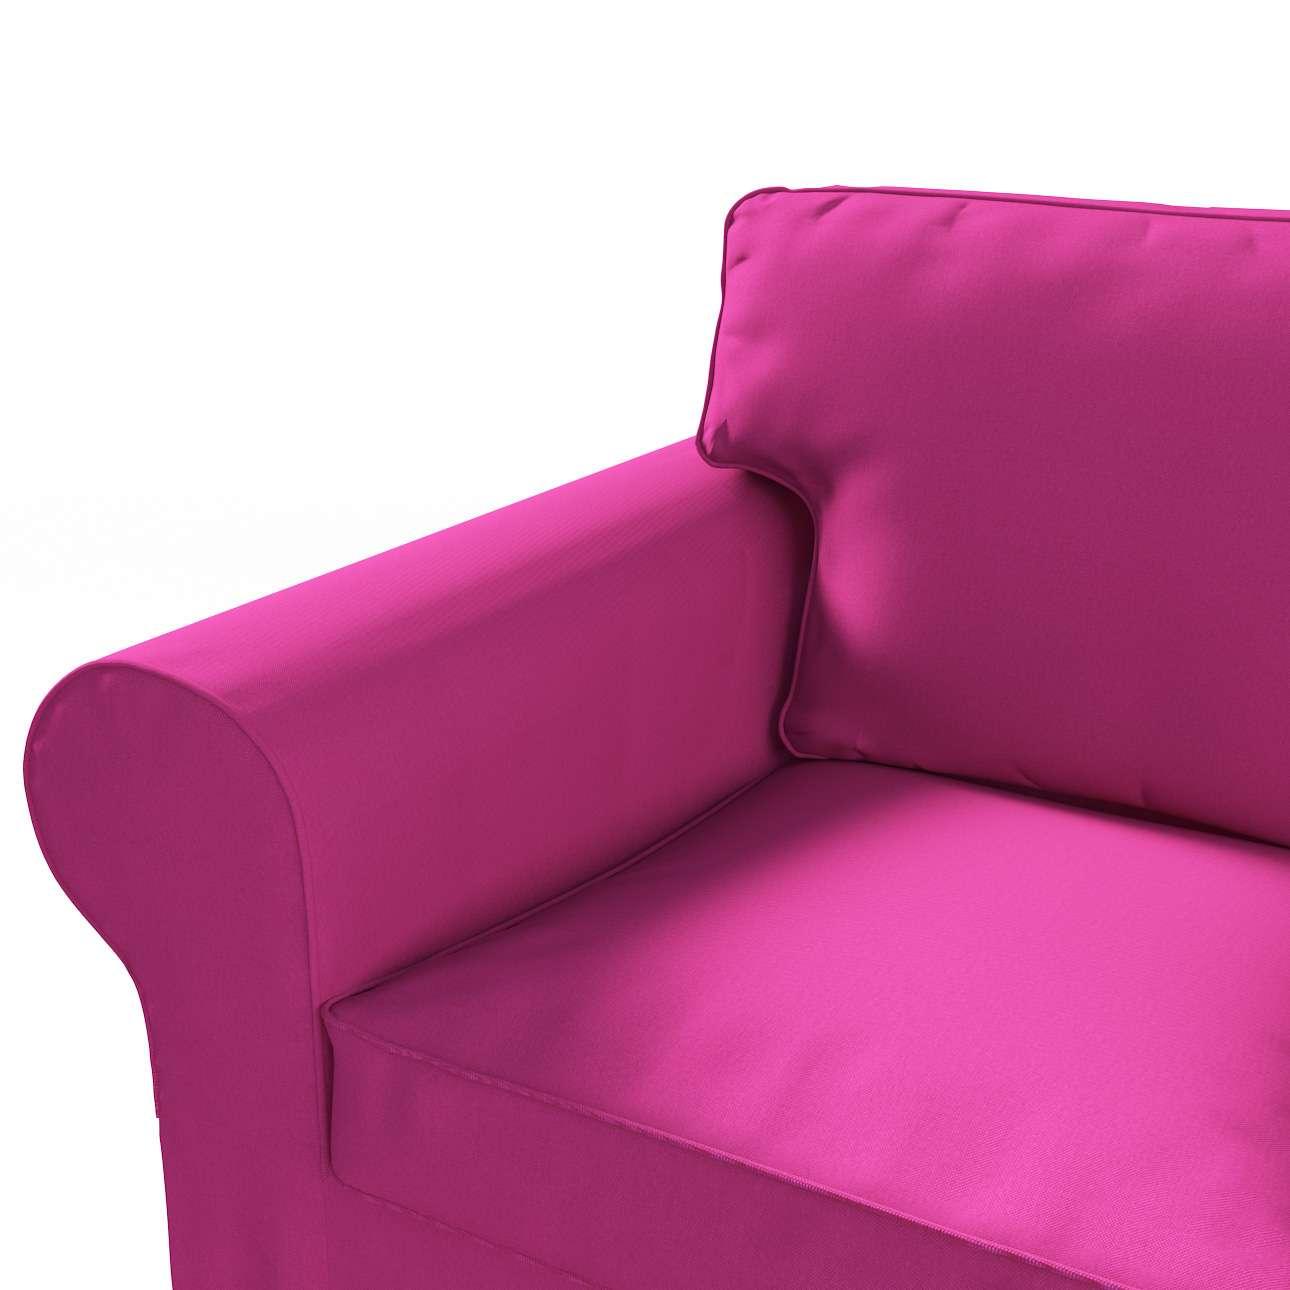 Ektorp 3-Sitzer Schlafsofabezug neues Modell (2013) Ektorp 3-Sitzer, ausklappbar, neues Modell ( 2013) von der Kollektion Etna, Stoff: 705-23